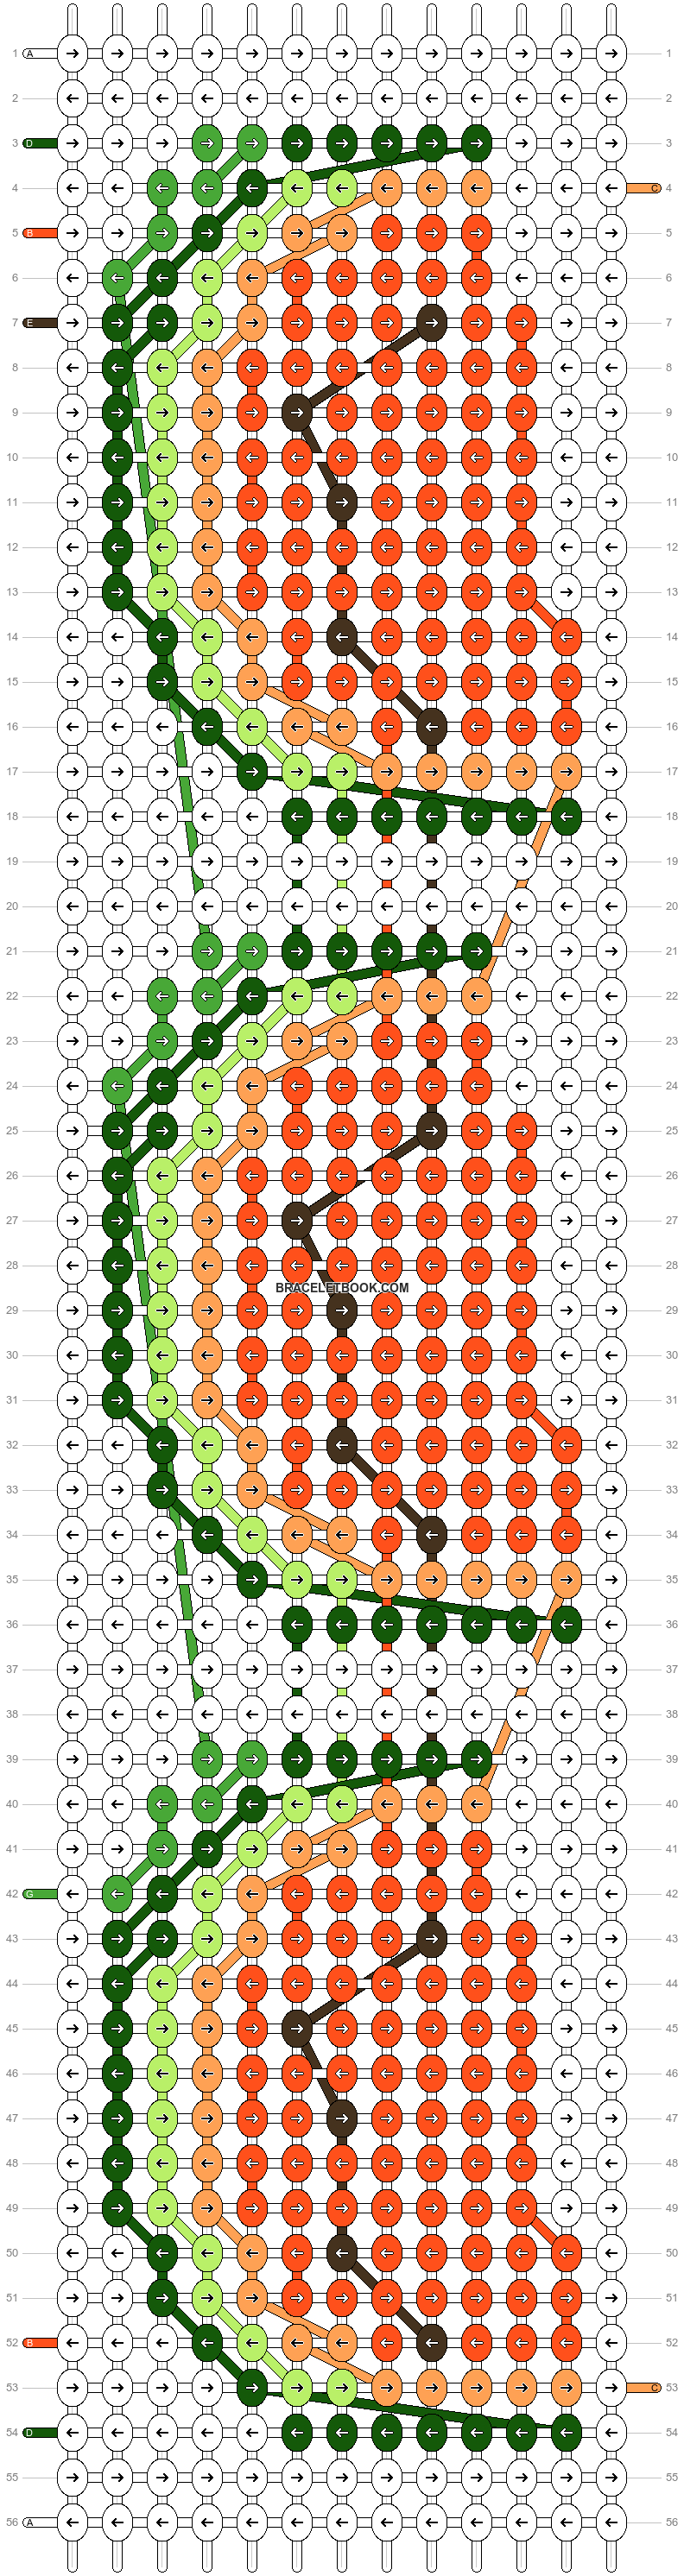 Alpha pattern #17197 pattern